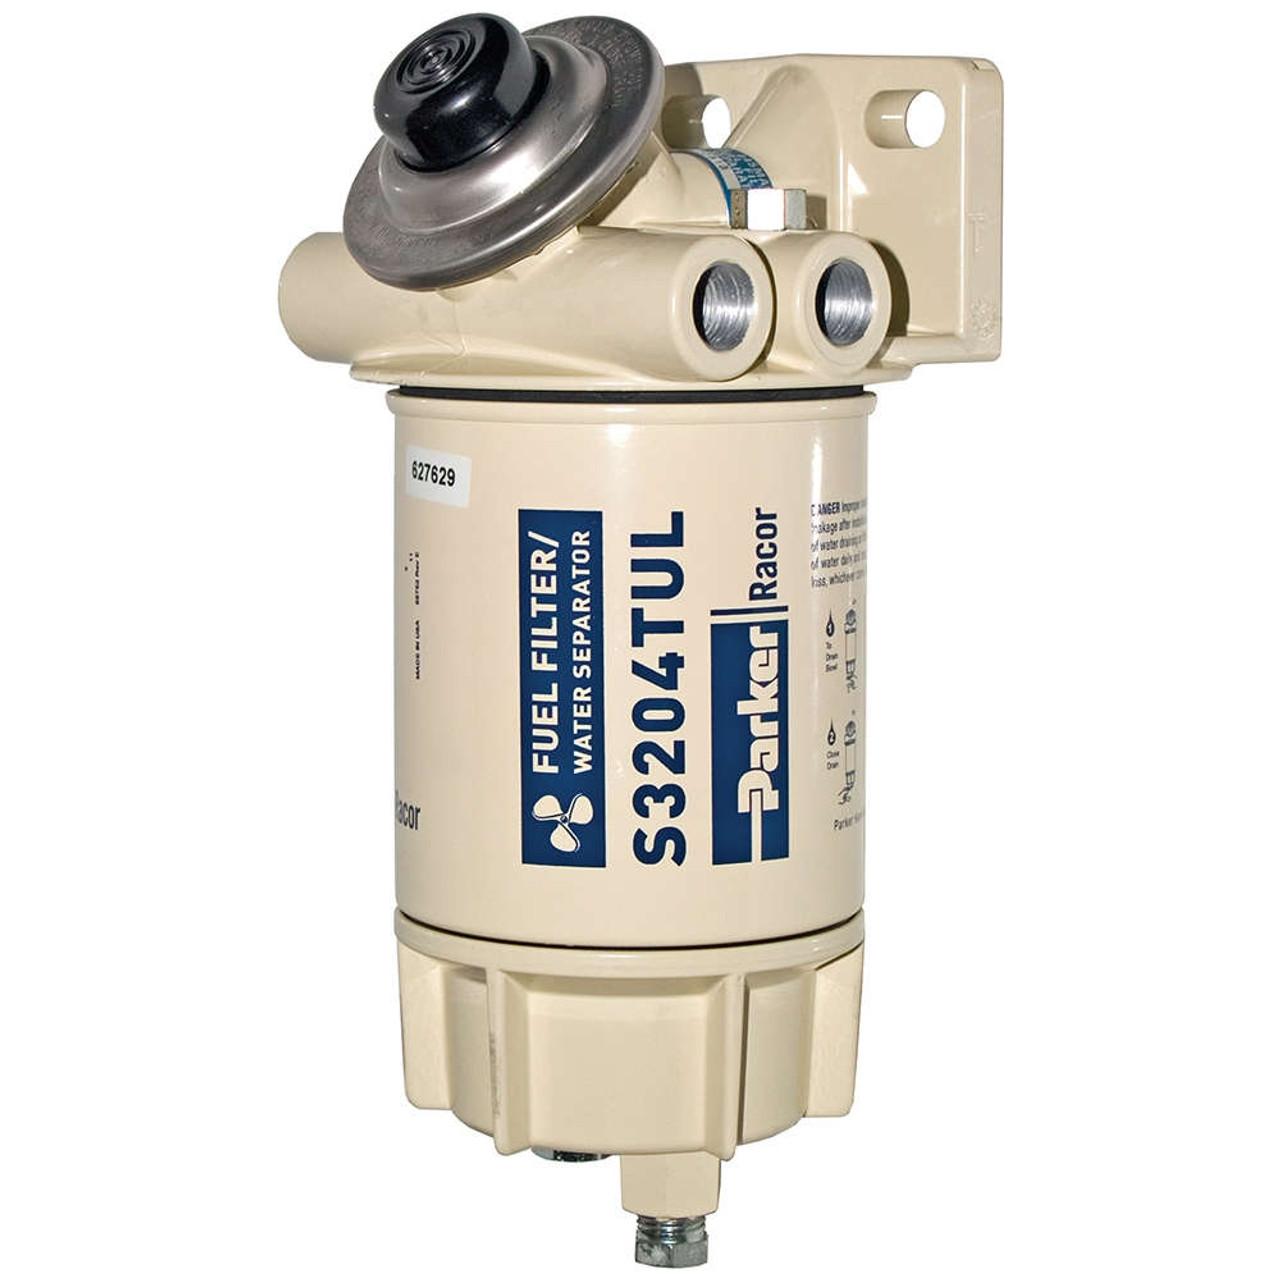 Racor Aquabloc Marine 3/8 in. 45 GPH Spin-On Diesel Fuel Filter Water  Separator Assembly - 6 Qty - John M. Ellsworth Co. Inc.John M. Ellsworth